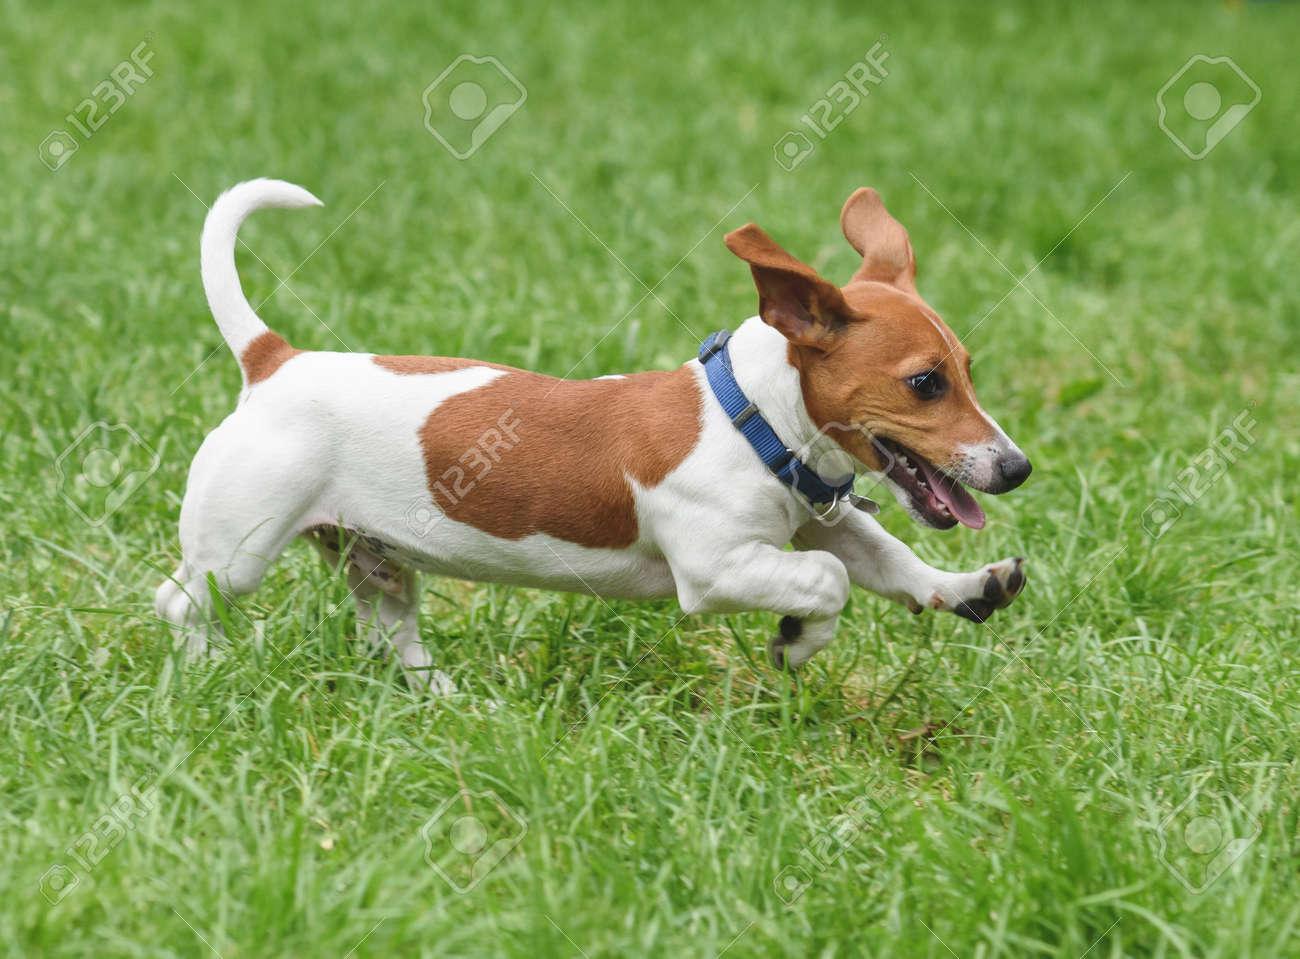 Puppy Of Jack Russell Terrier Pet Dog Running On Green Grass Stock